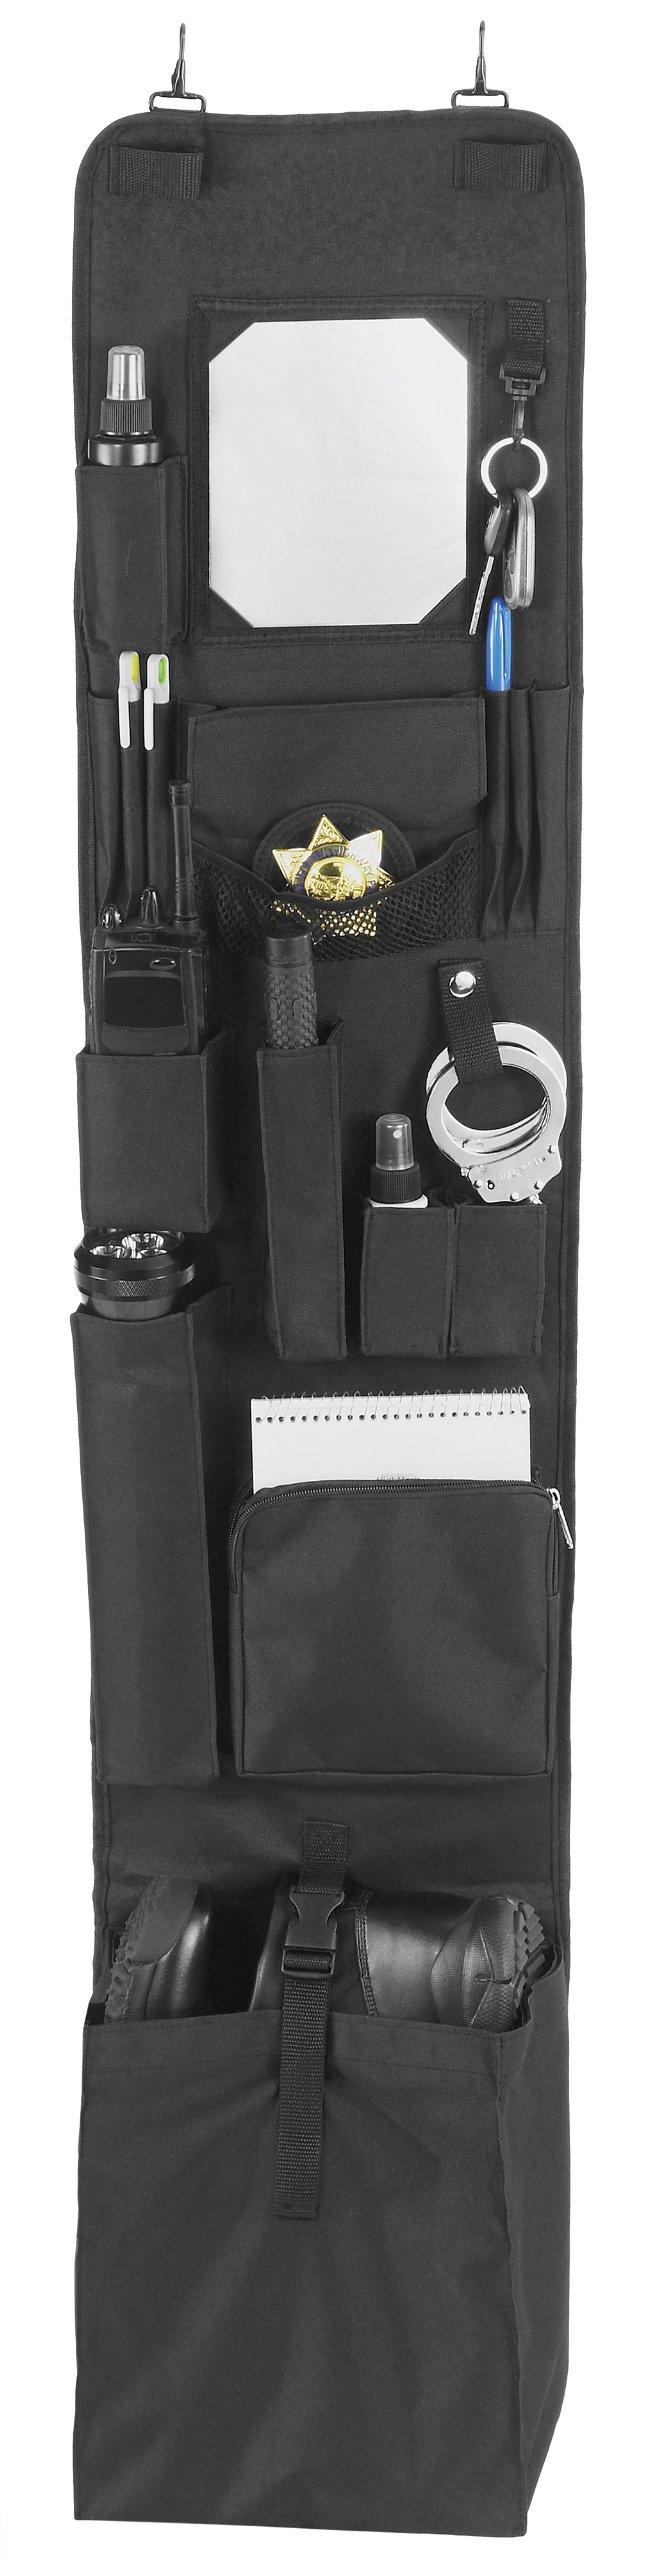 EXPLORER Police Style Hanging Locker or Closet Door Organizer 11'' x 52'' - Locker Org